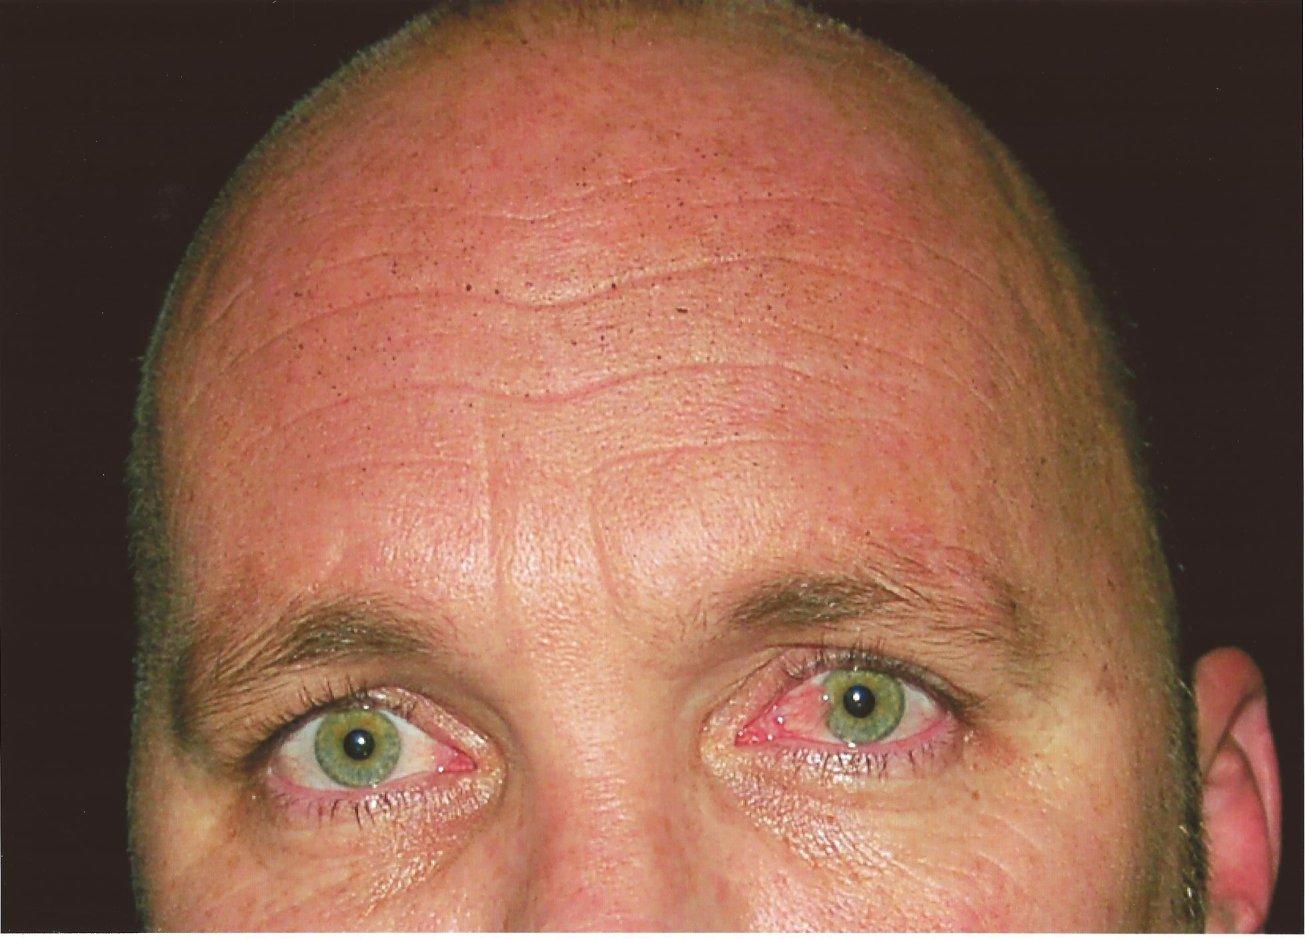 Close up forehead GSR crime scene photo